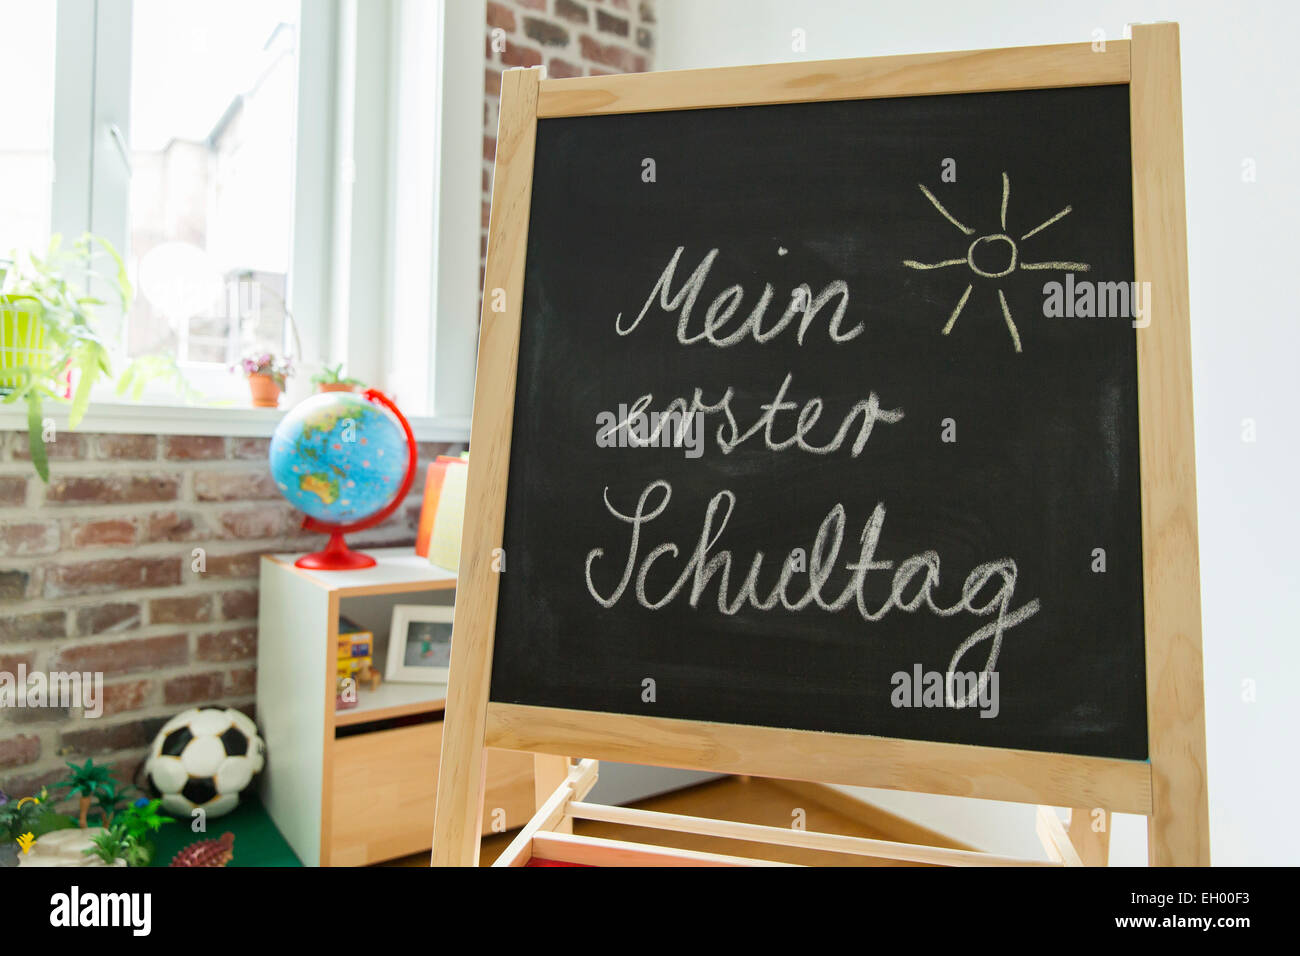 Tafel im Kinderzimmer Stockfoto, Bild: 79291047 - Alamy